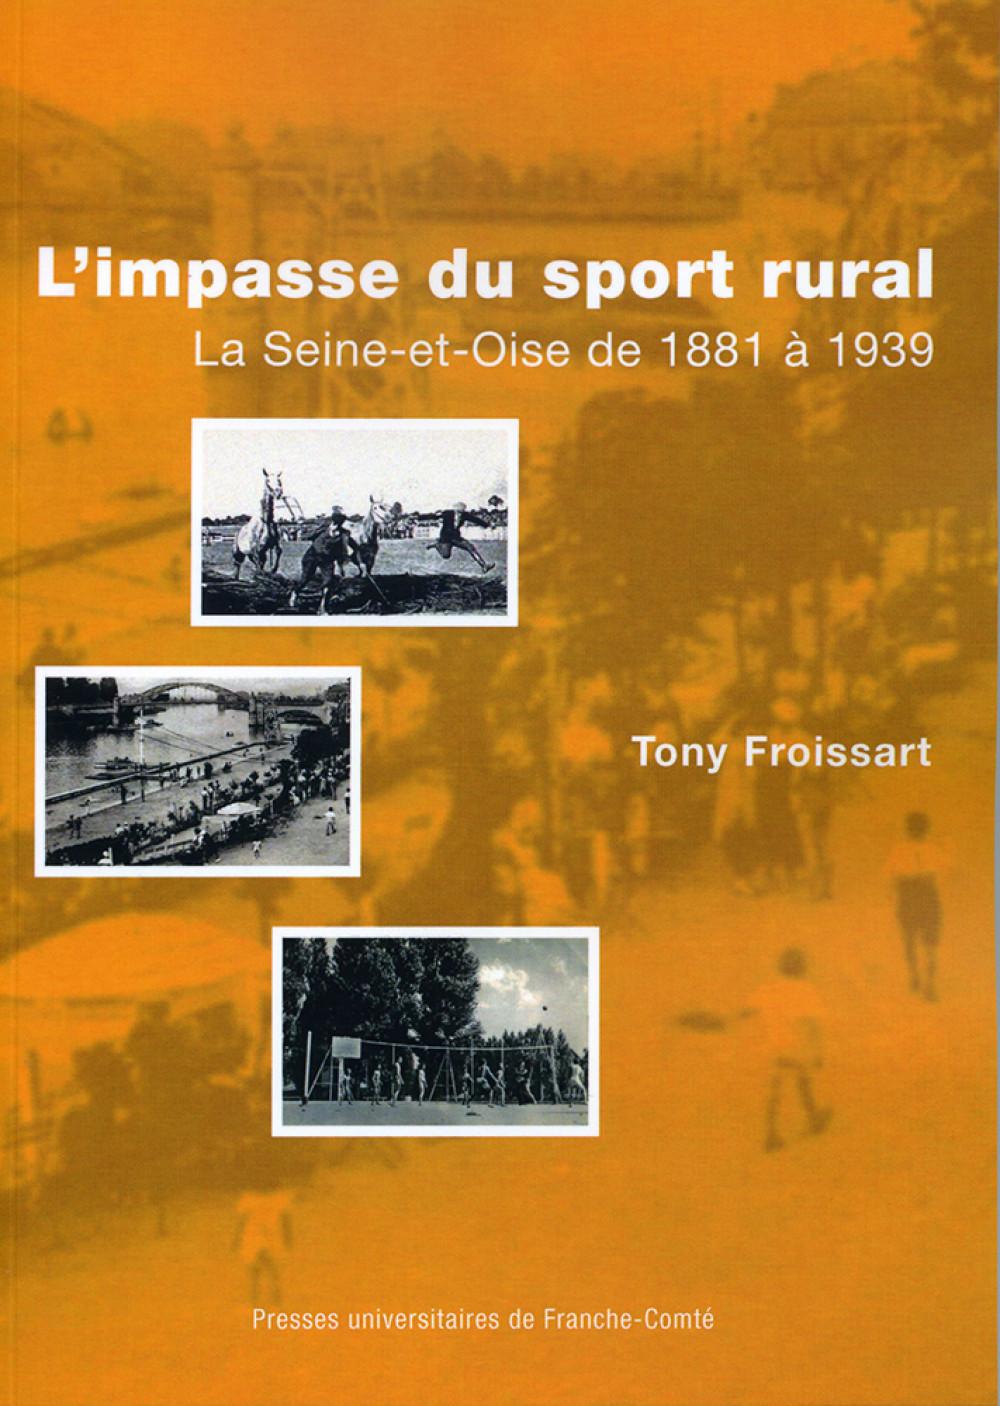 L'impasse du sport rural